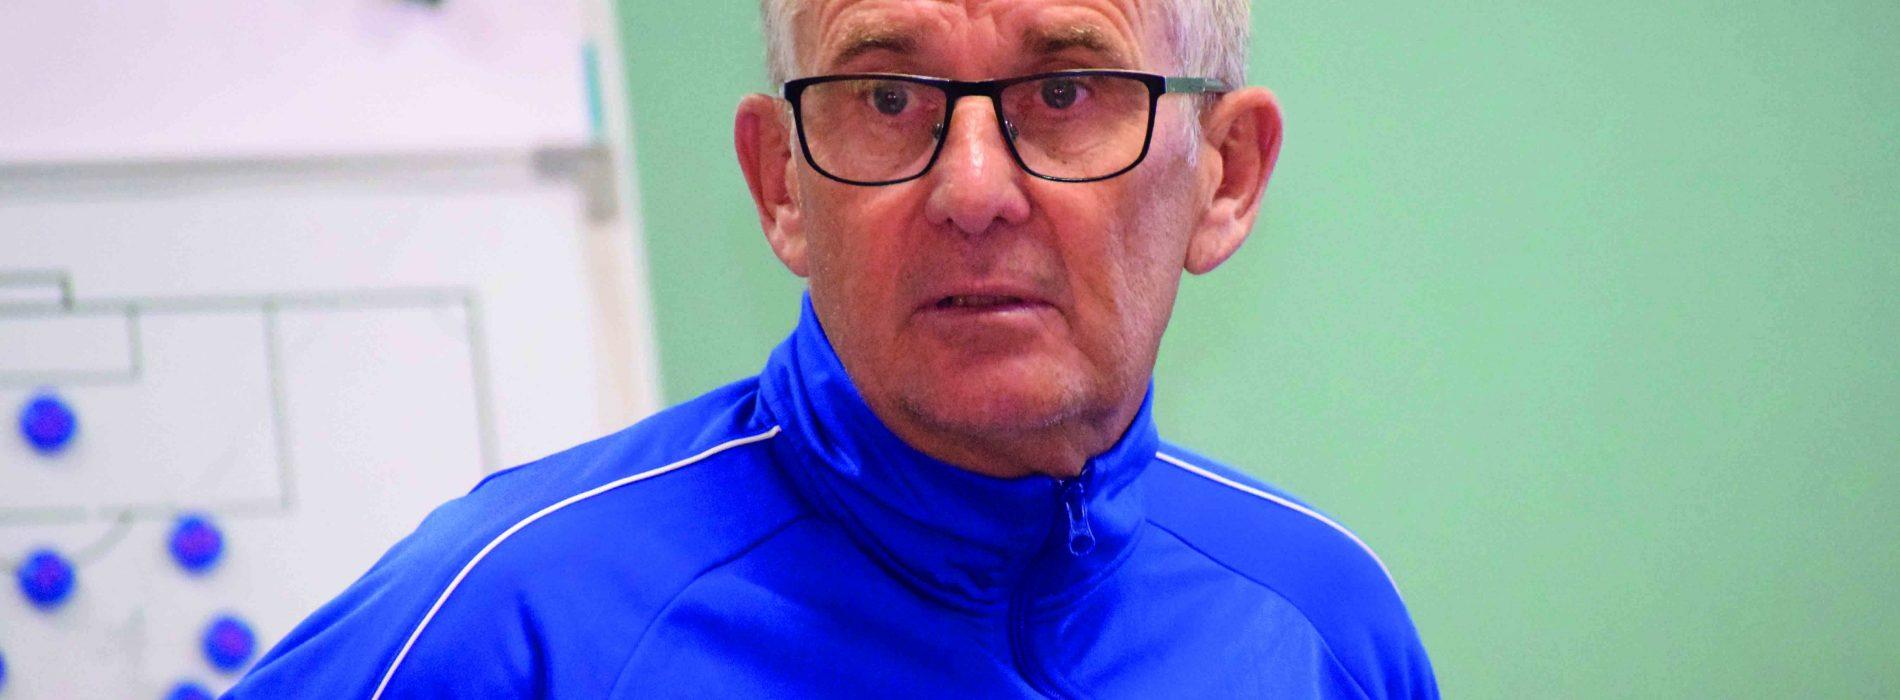 Lefa trains youth coaches